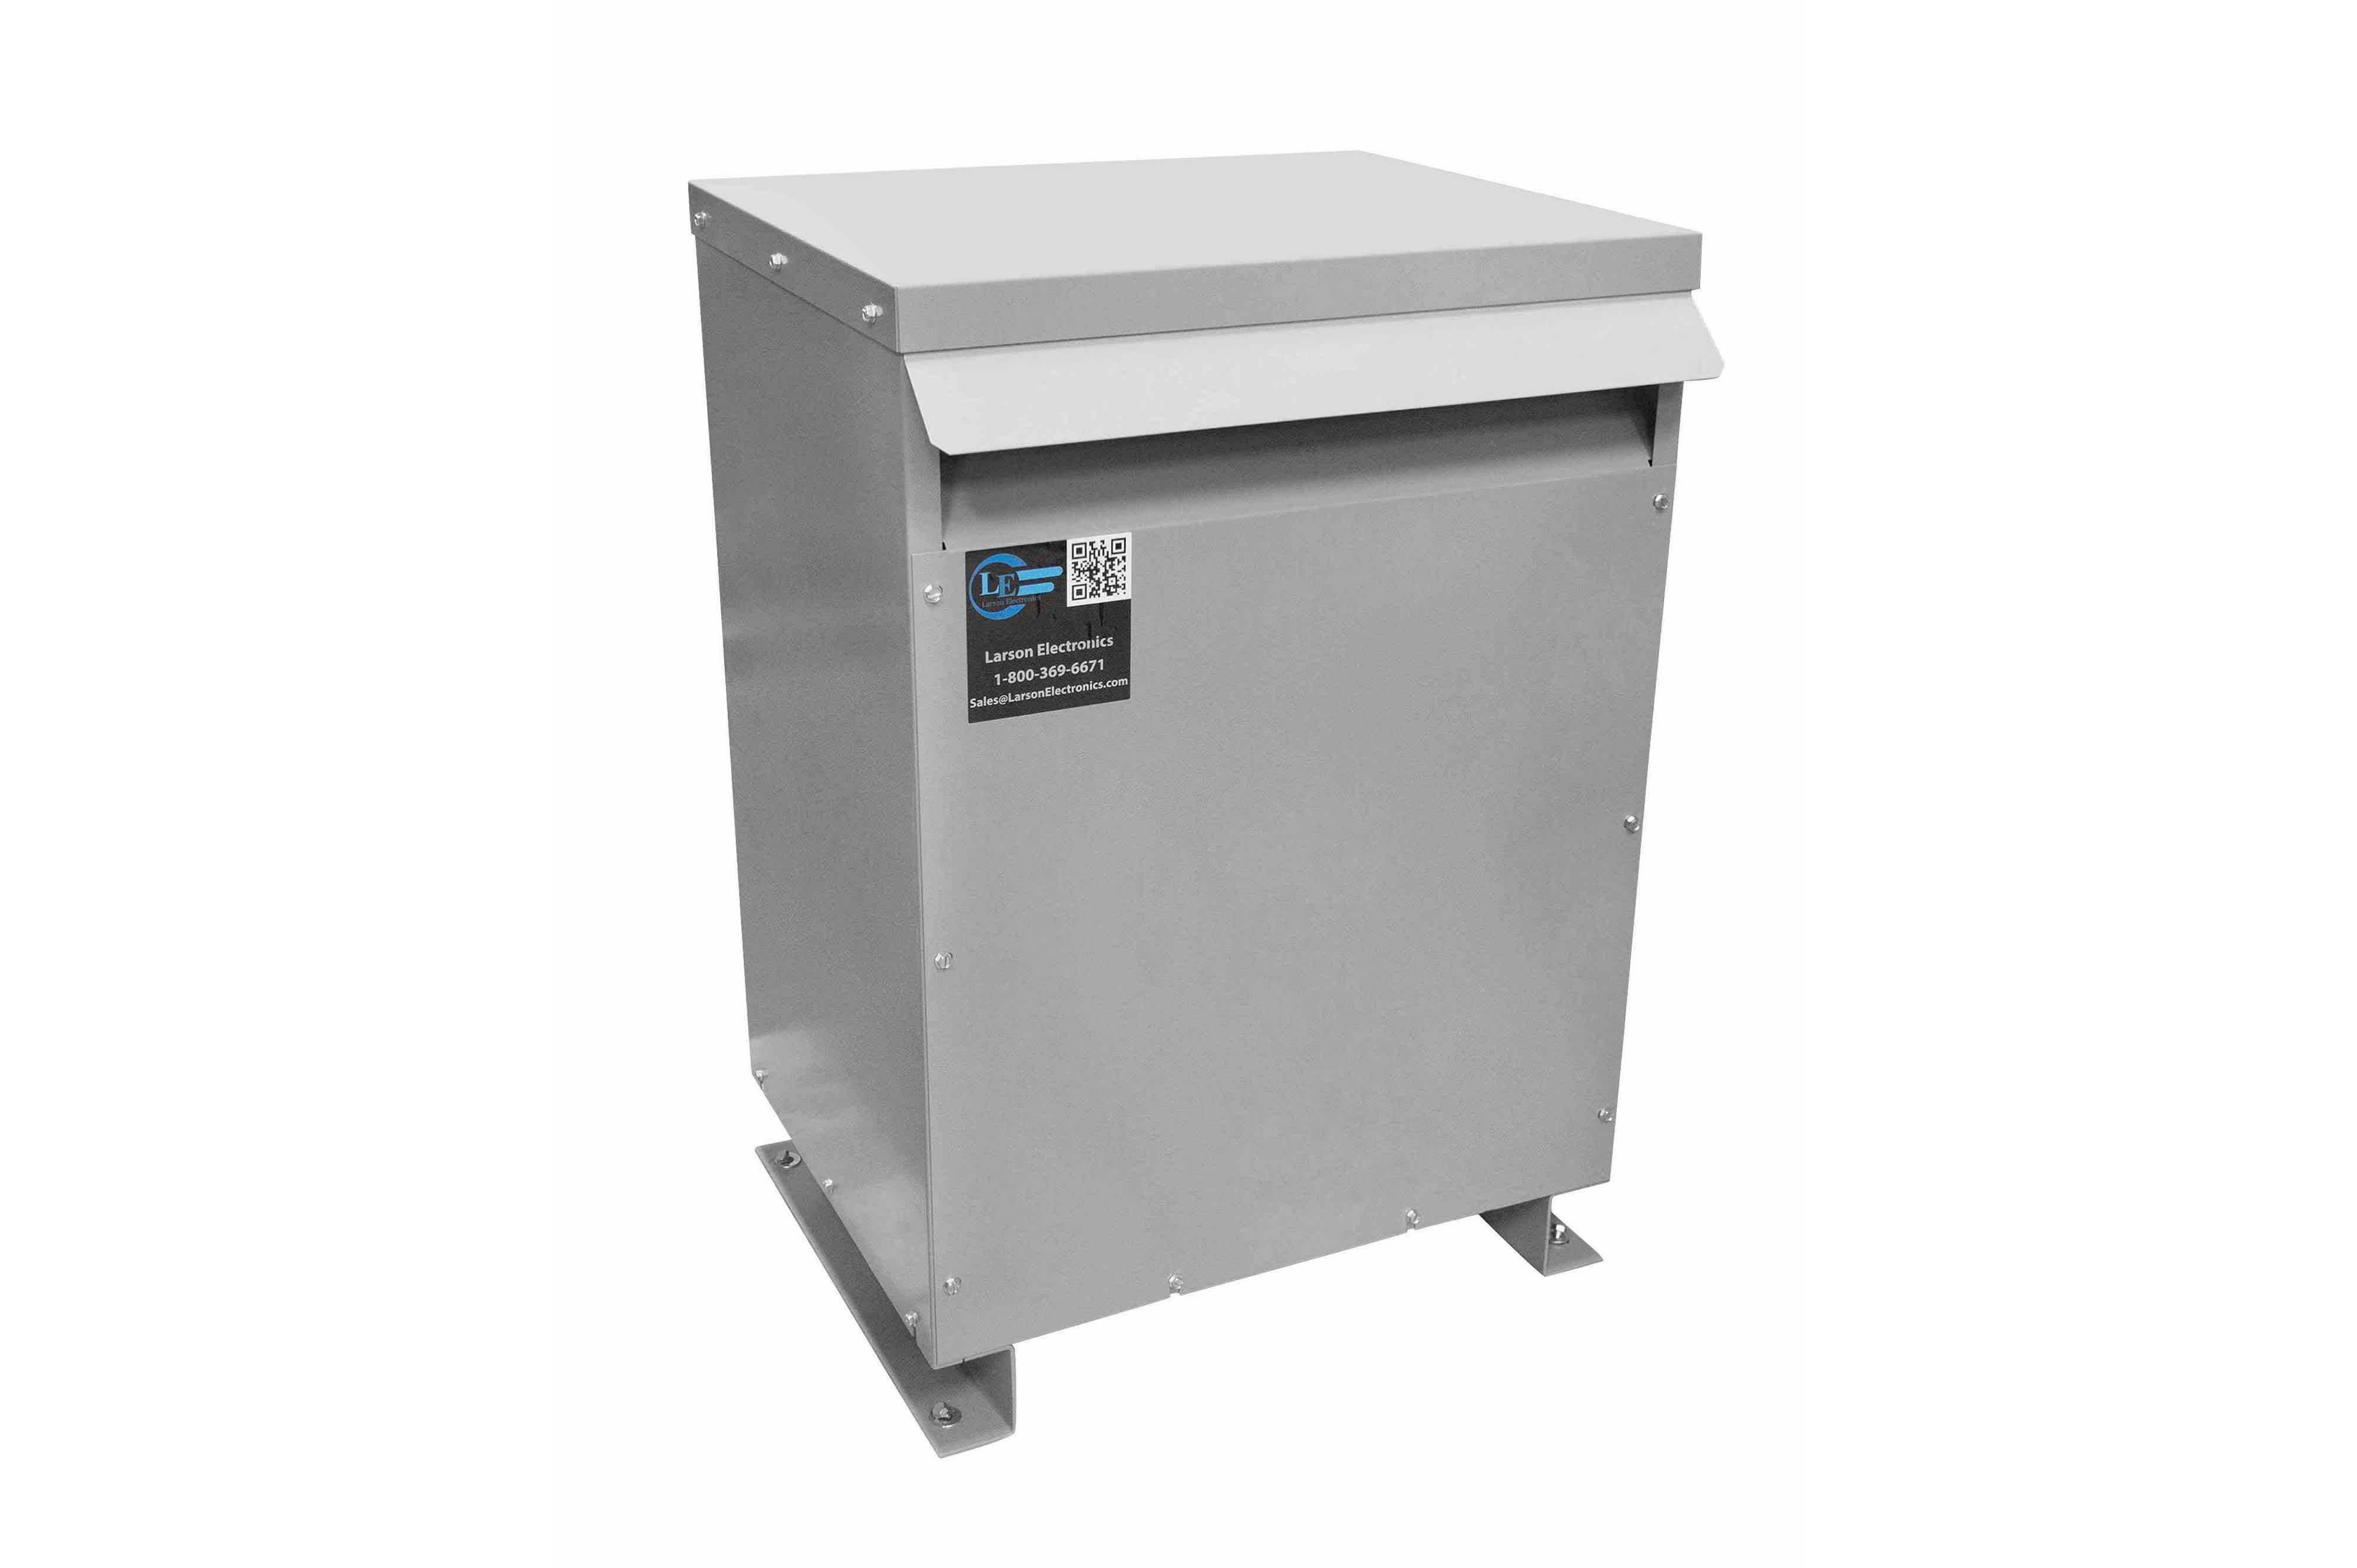 10 kVA 3PH Isolation Transformer, 400V Wye Primary, 480Y/277 Wye-N Secondary, N3R, Ventilated, 60 Hz